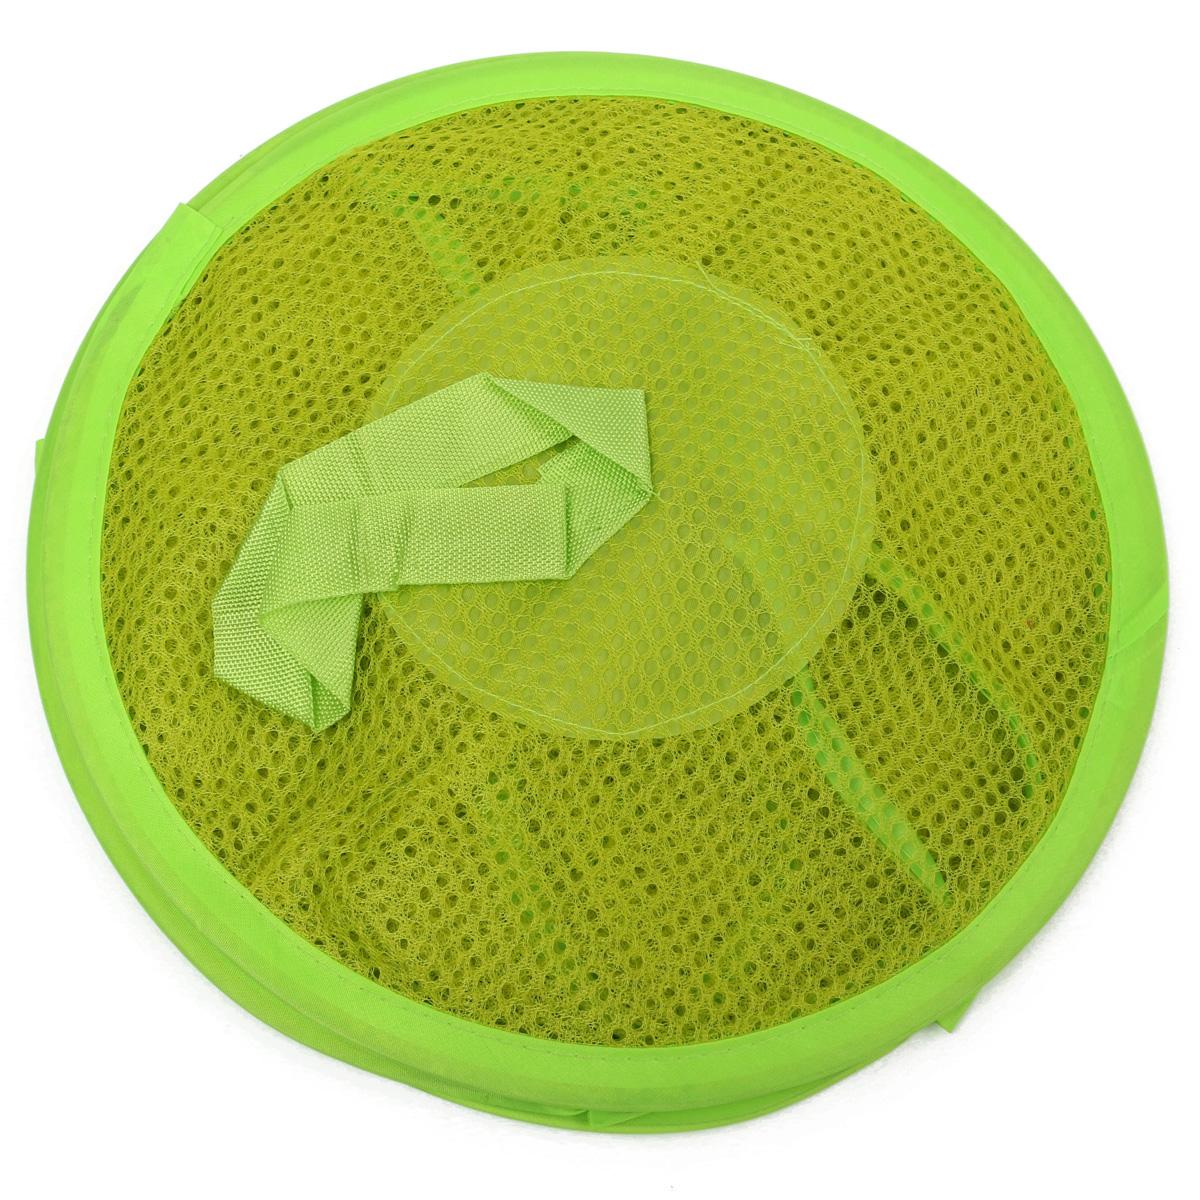 3 couche sac poche de rangement mural suspendu - Filet de rangement suspendu ...